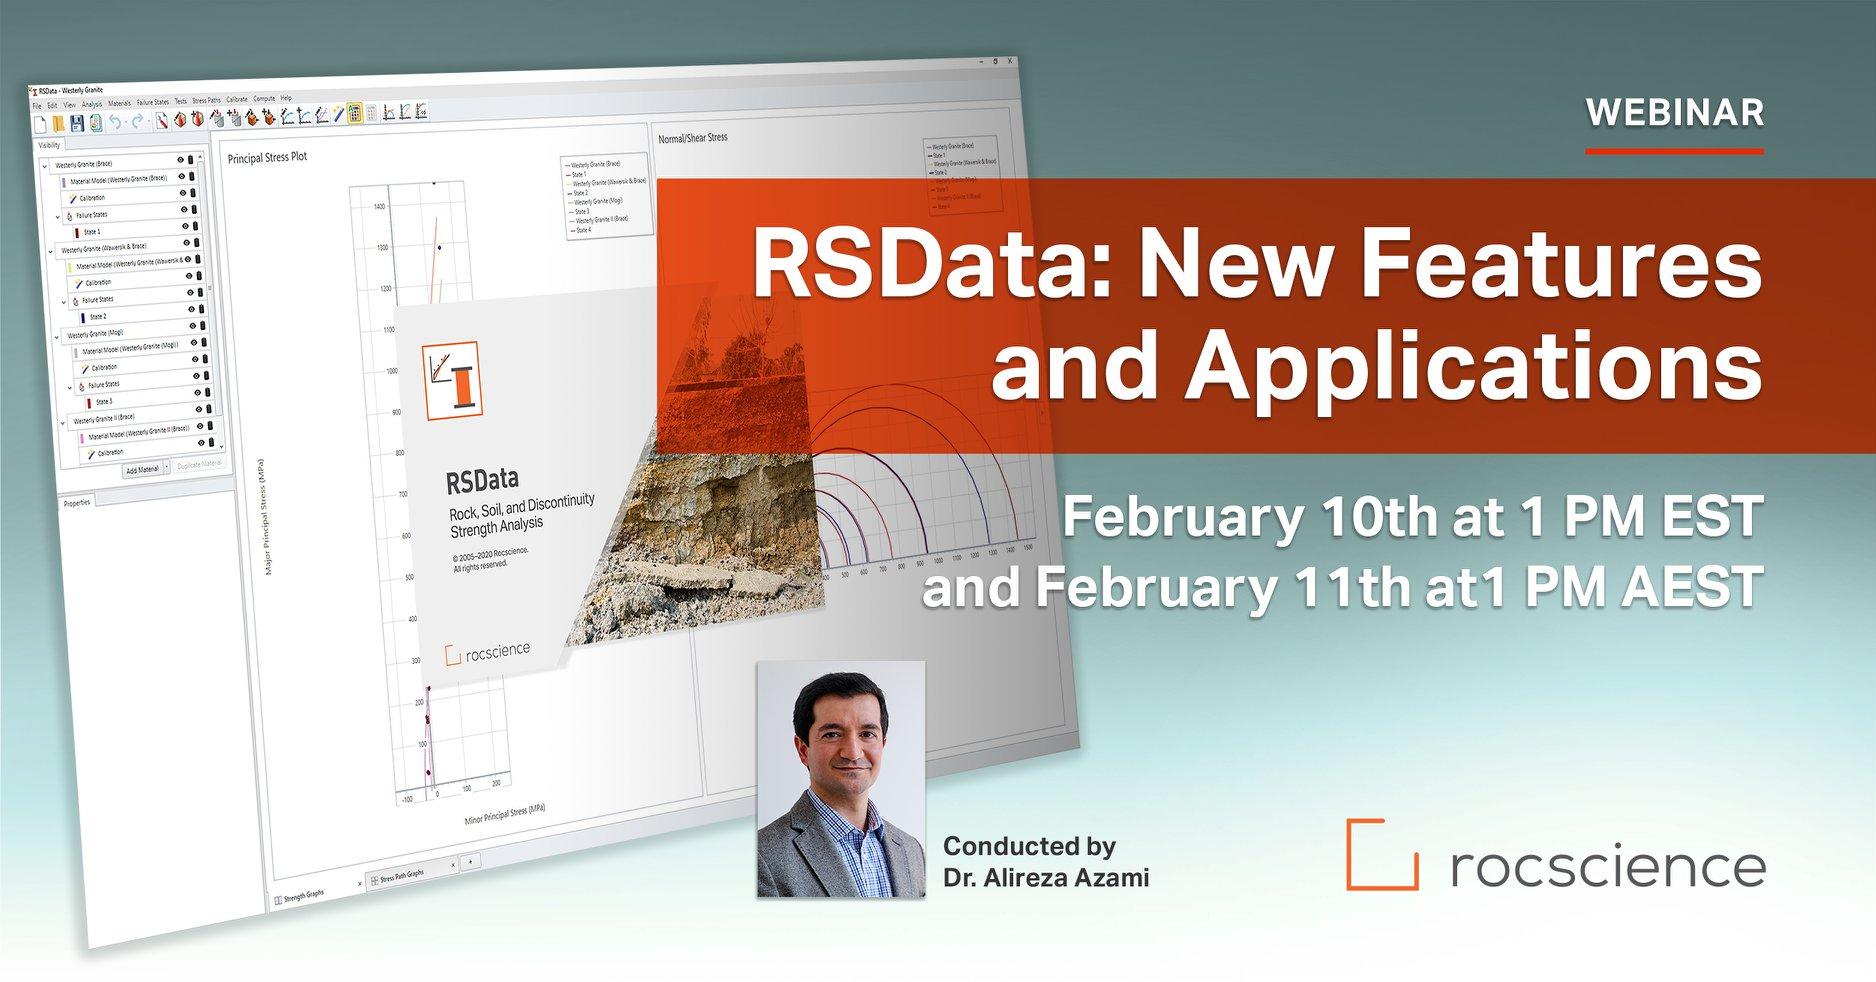 Rocscience Webinar: RSData - New Features & Applications